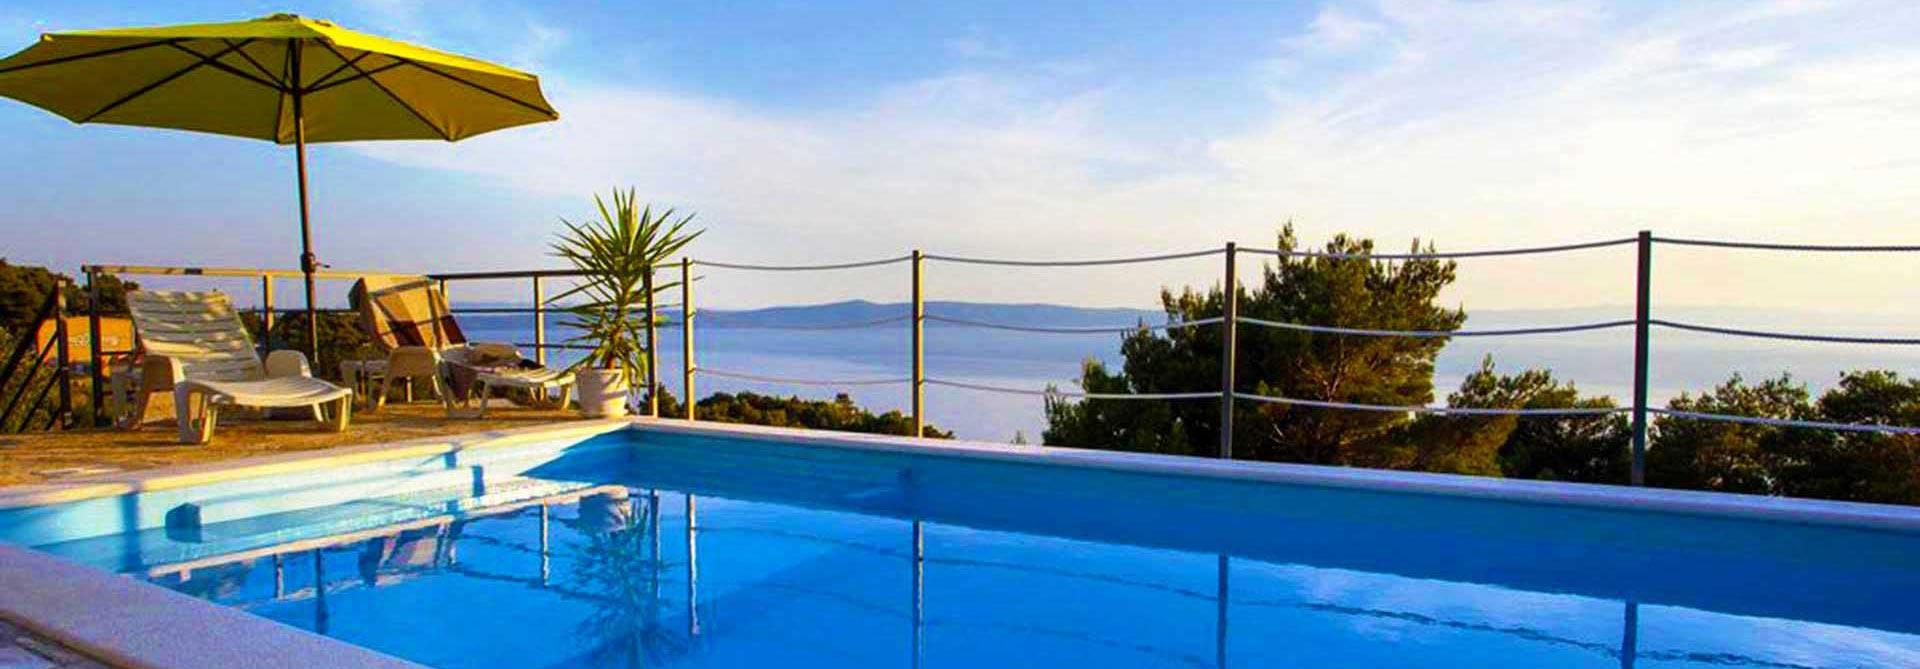 Ferienhaus tu epi mit pool villa ivana for Ferienhaus mit pool